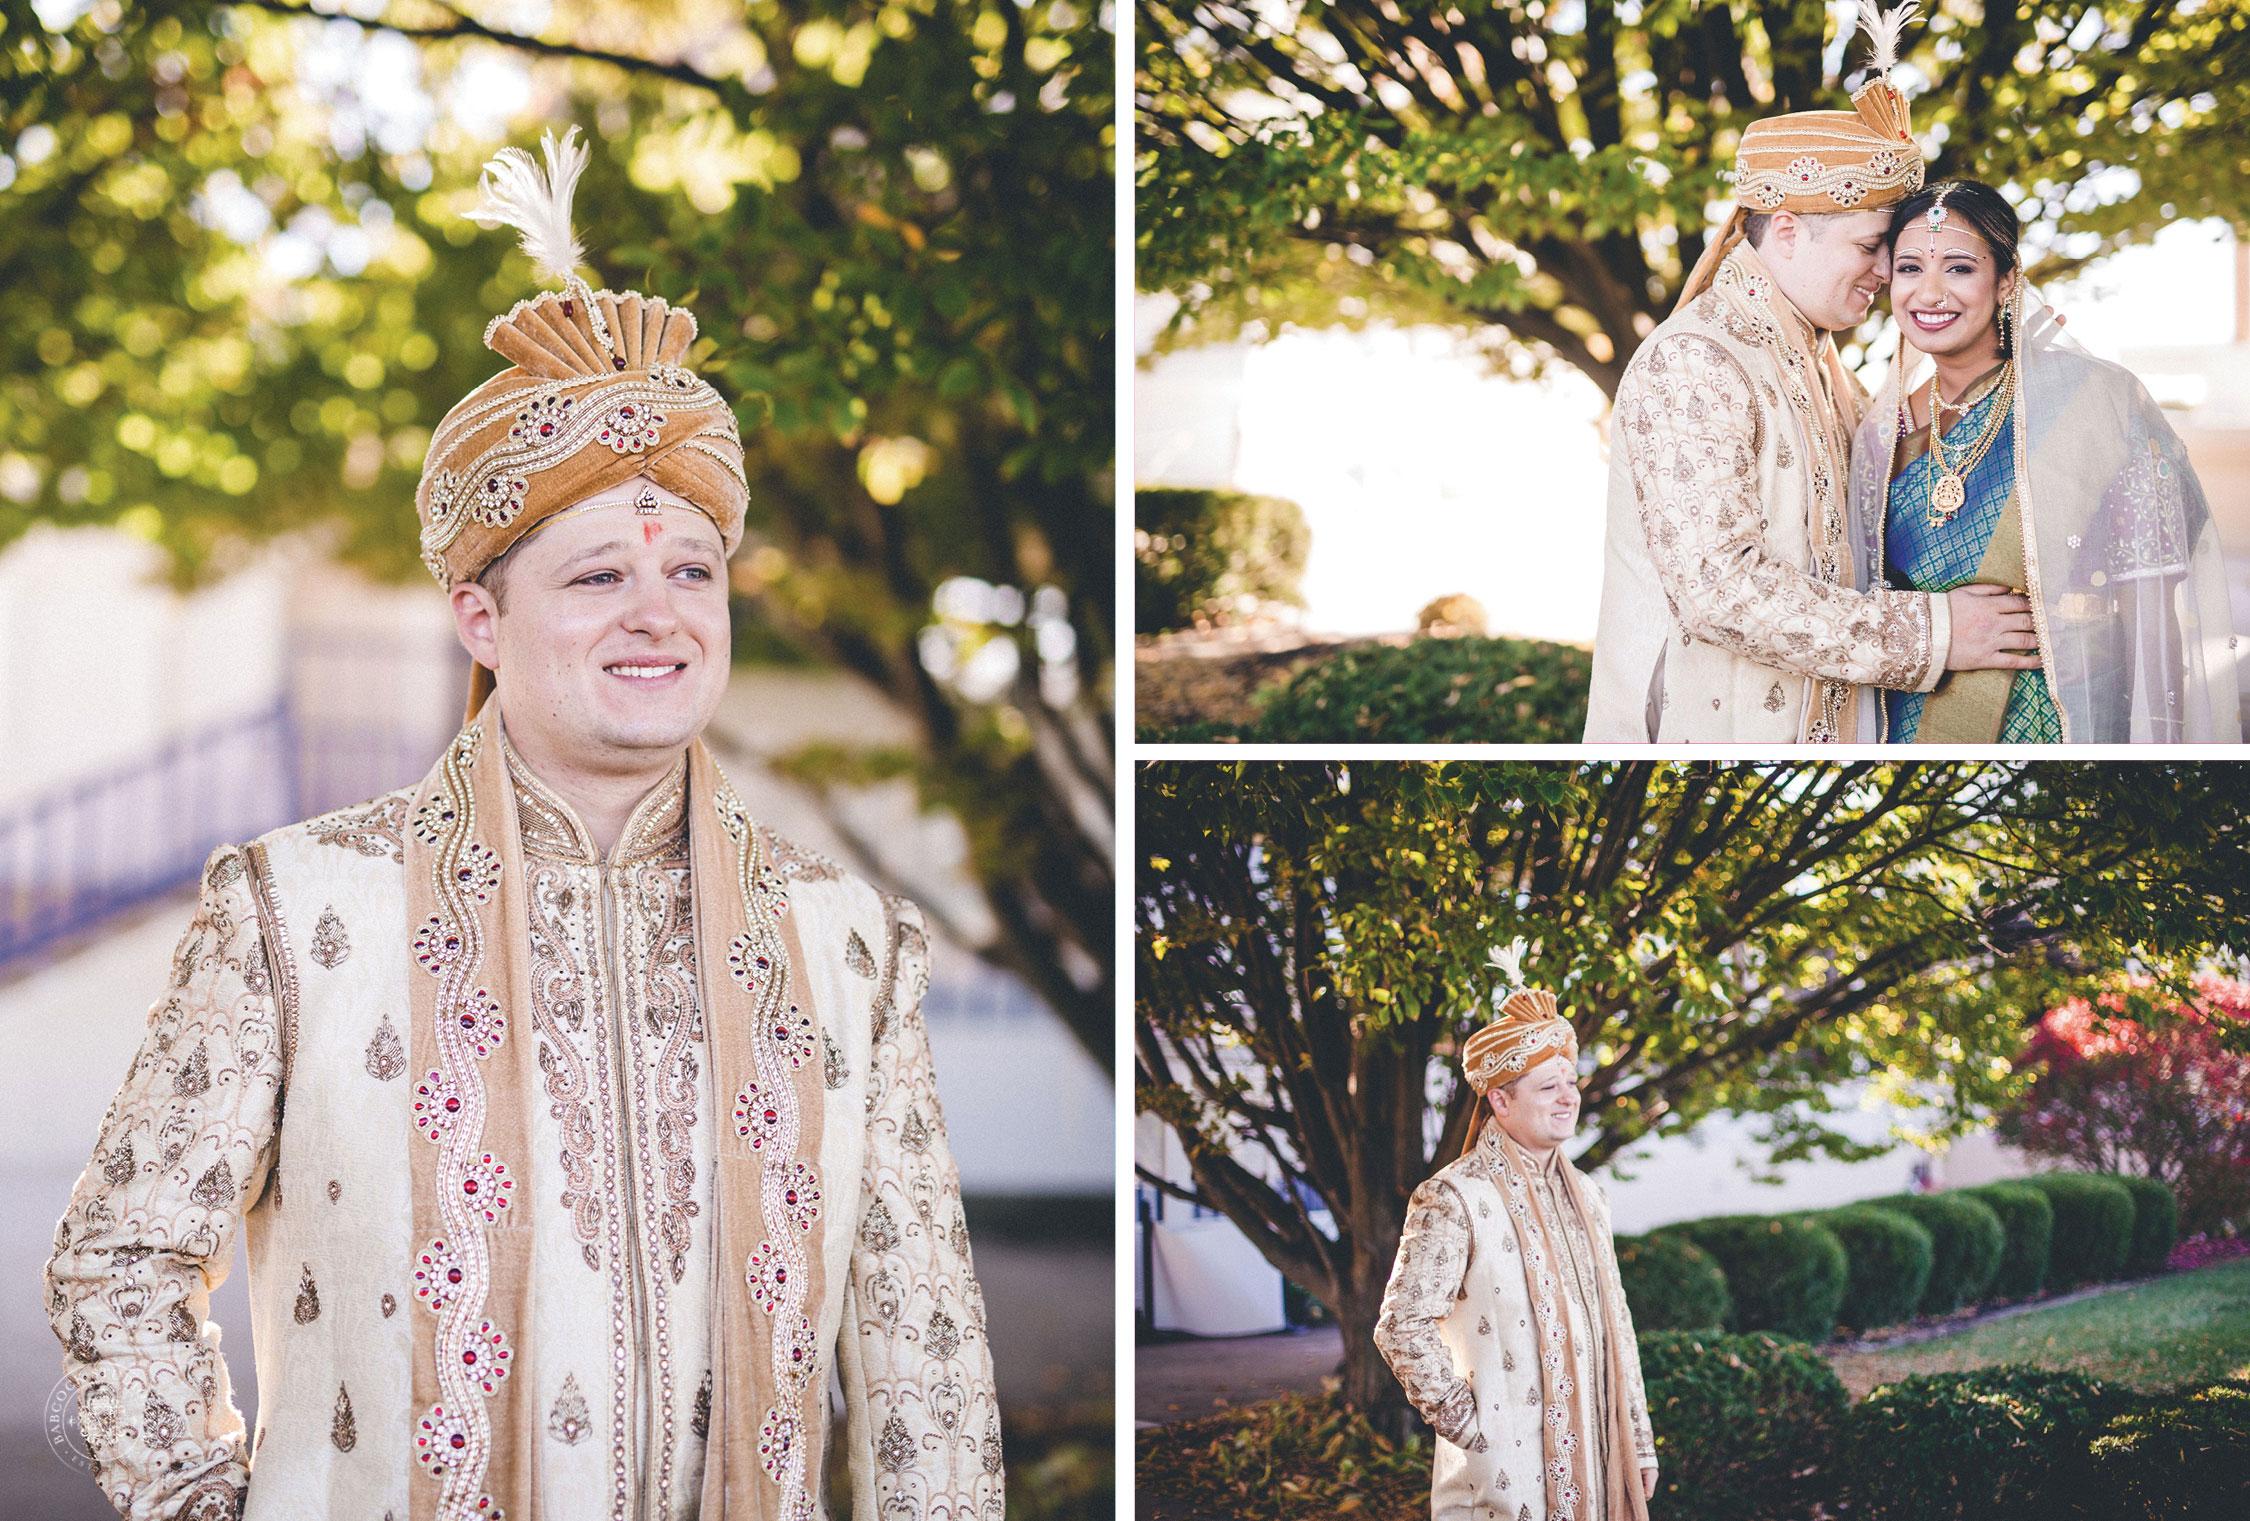 mayuri-brent-indian-wedding-photographer-dayton-ohio-24.jpg